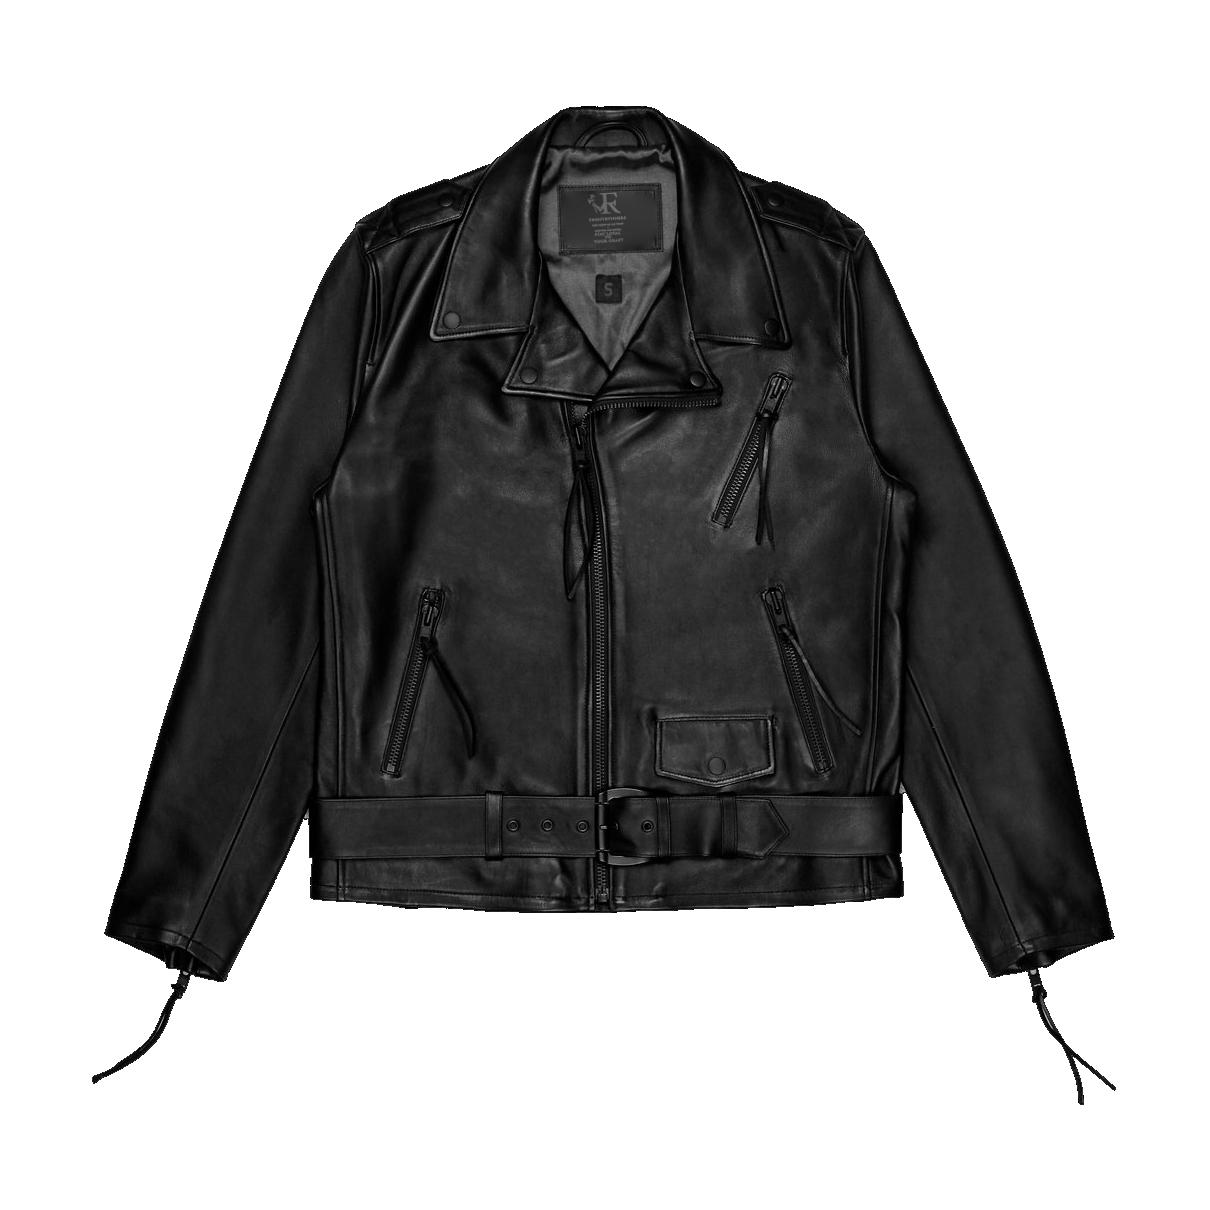 frontrvnners leather jacket front